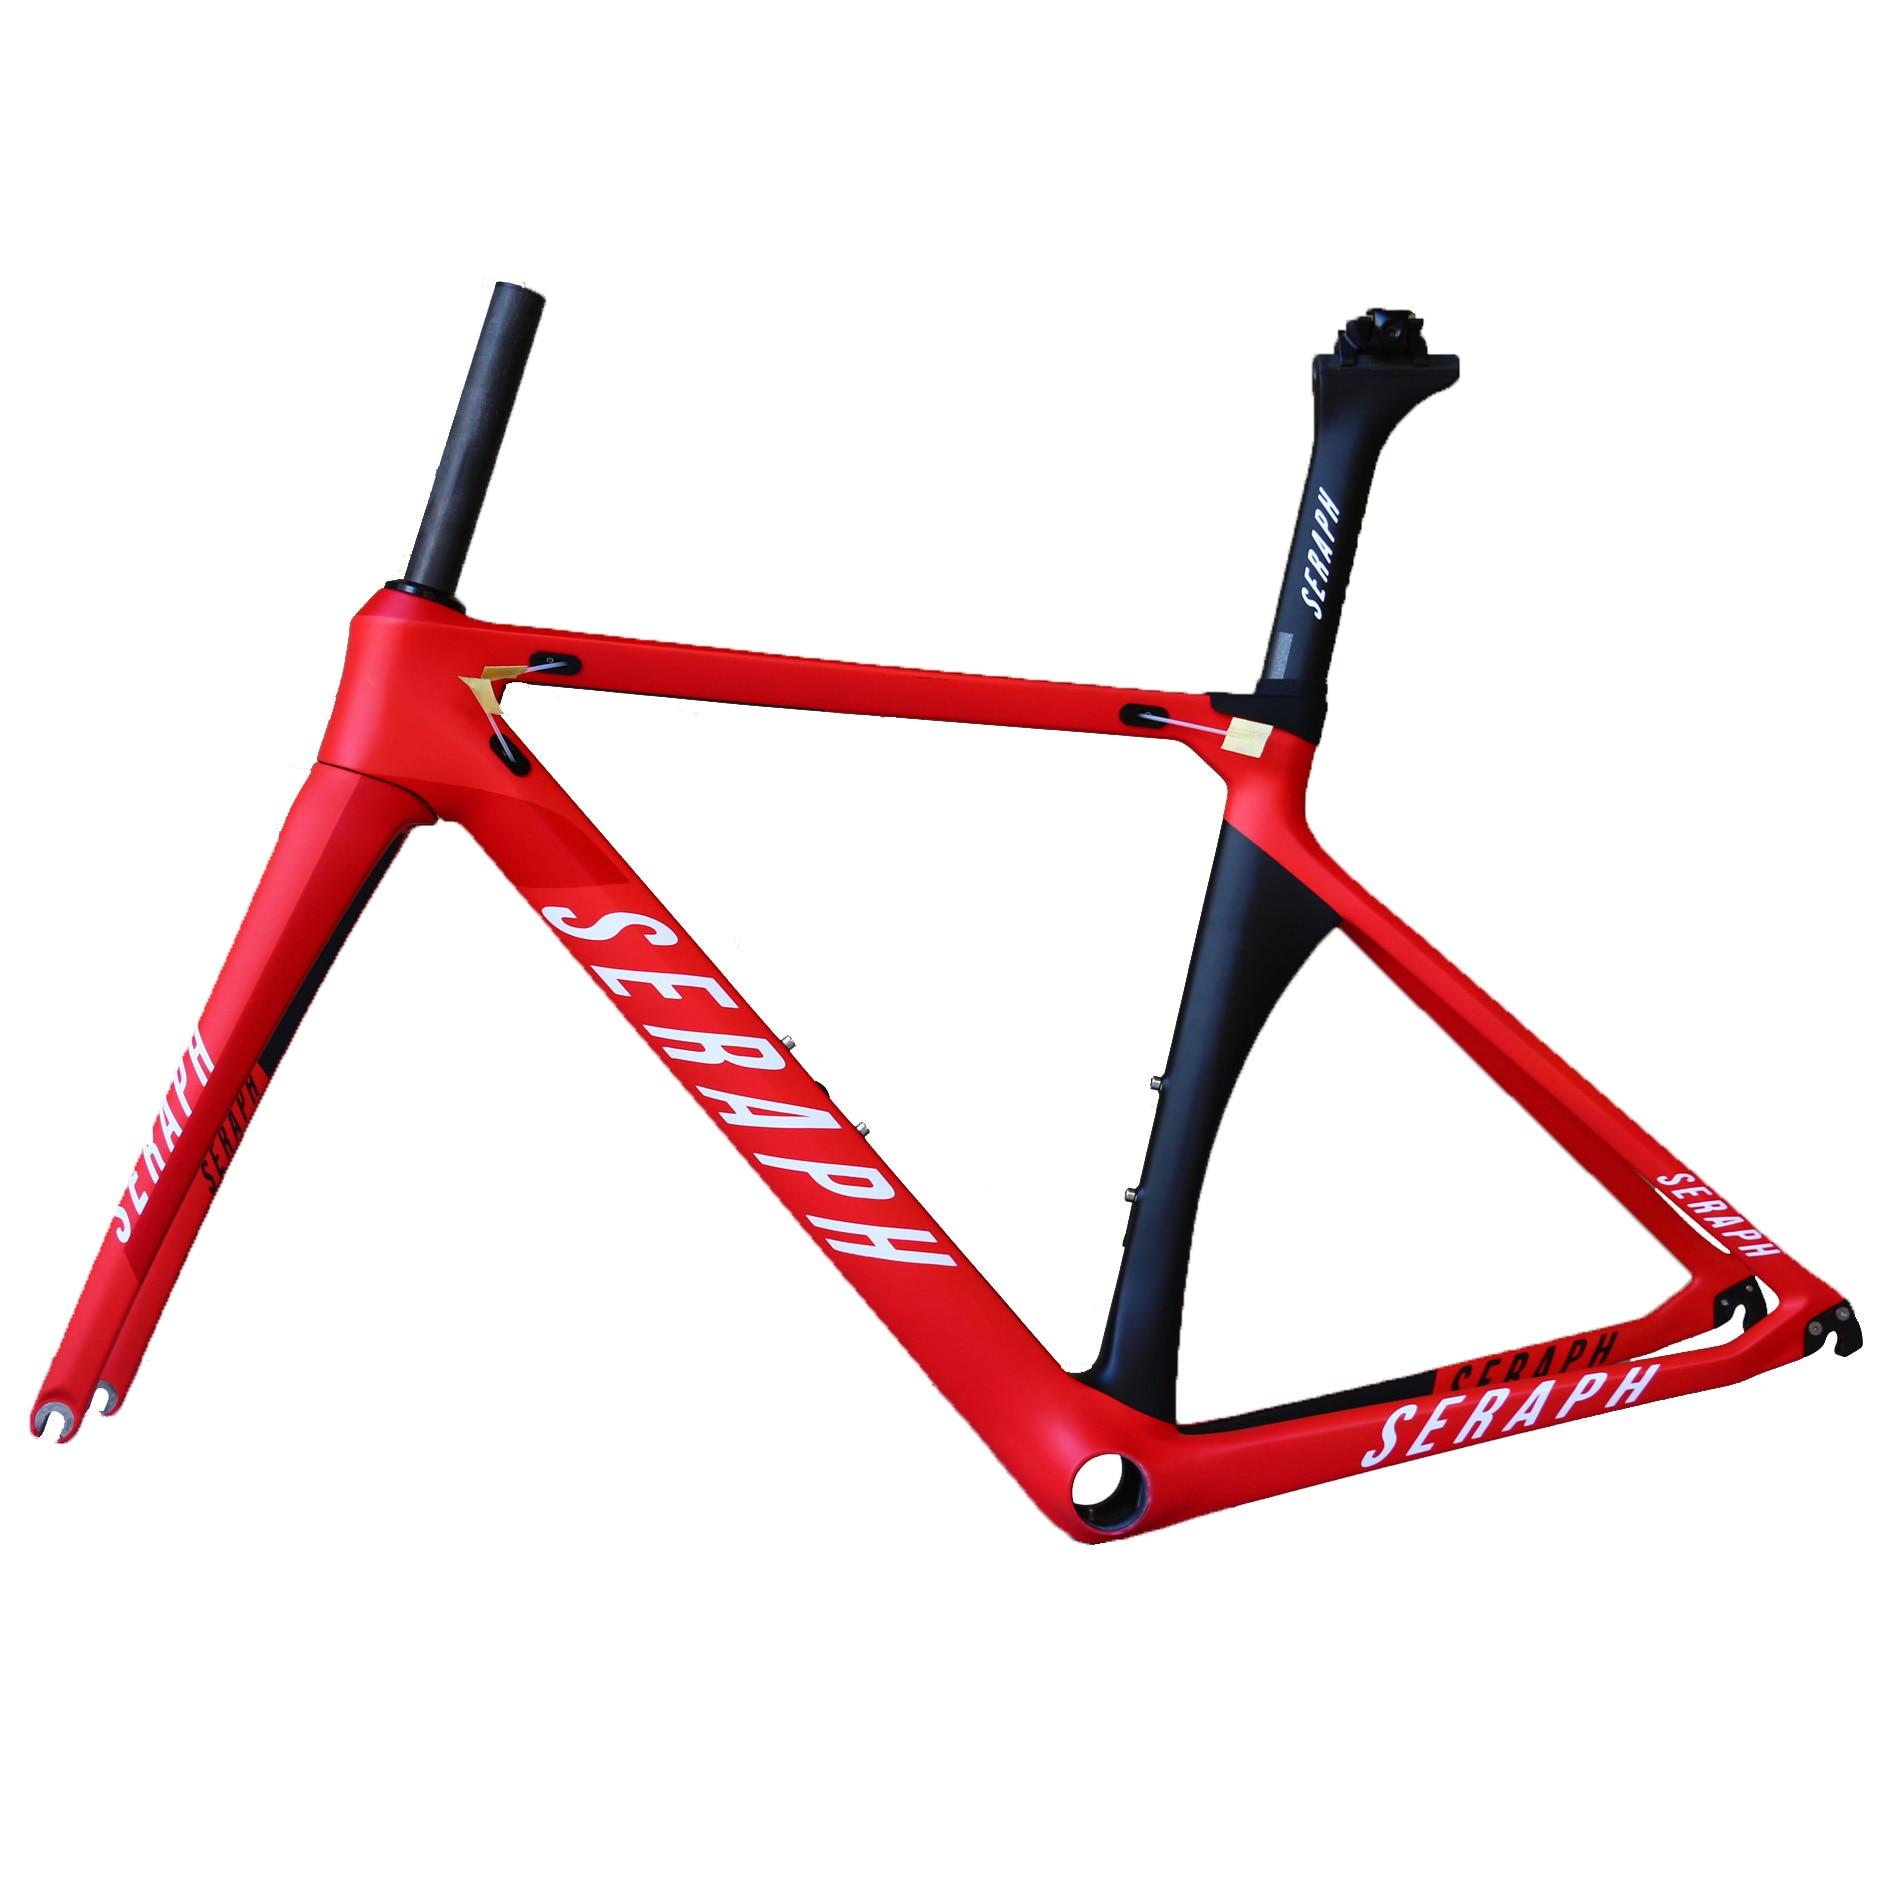 Hight Modulus customized paint carbon fiber  road  aero  bike  frame TT-X1(China)